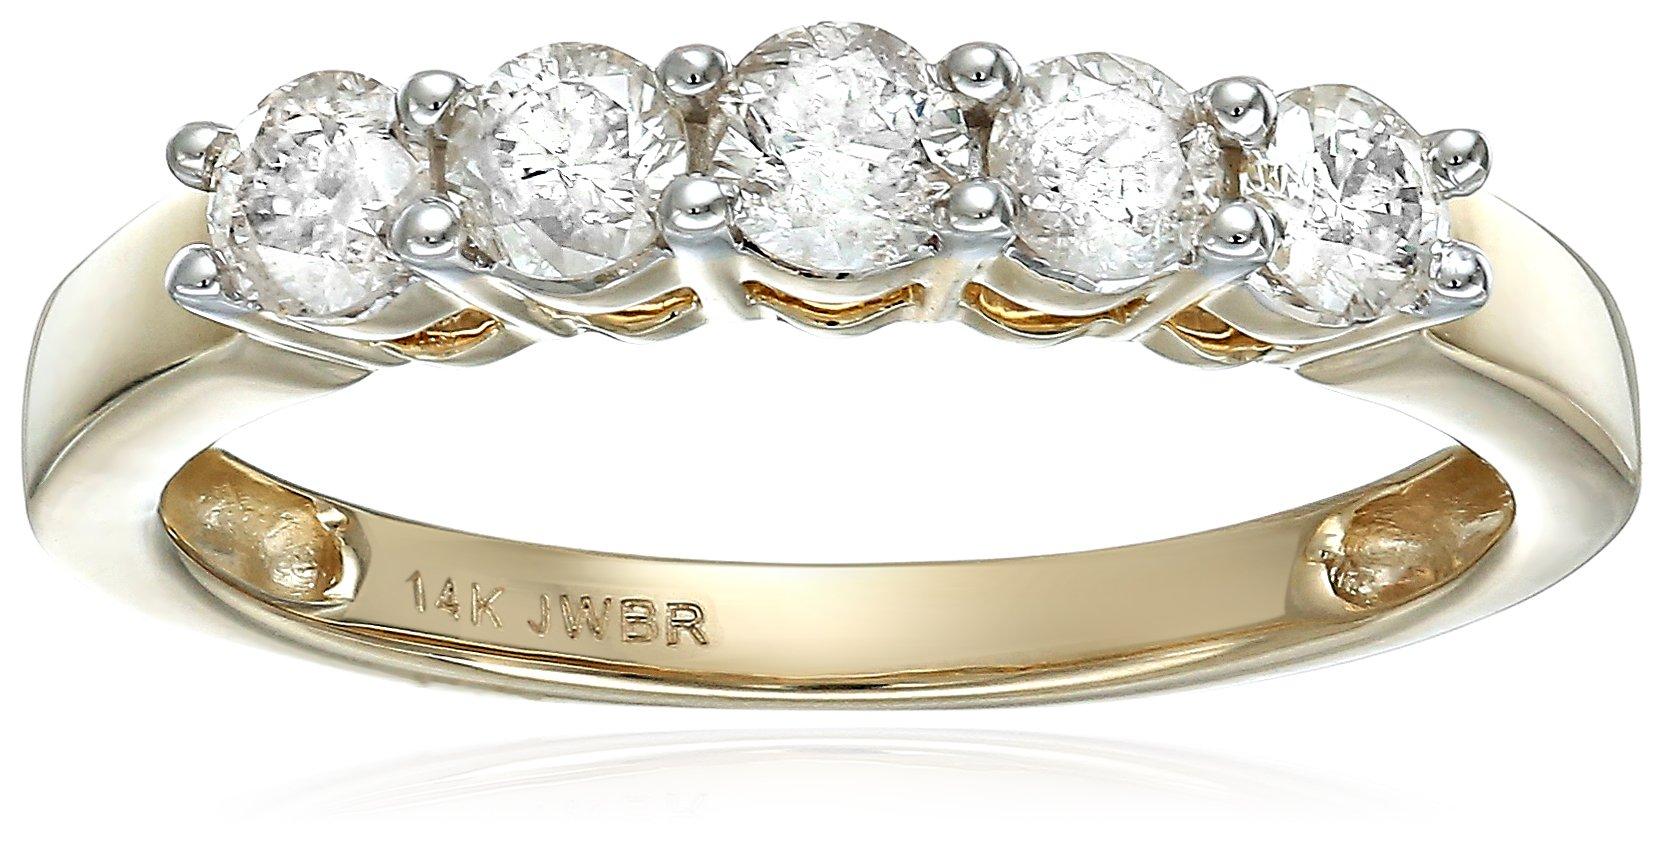 14k Yellow Gold 5 Stone Diamond Anniversary Ring(1/2cttw), Size 7